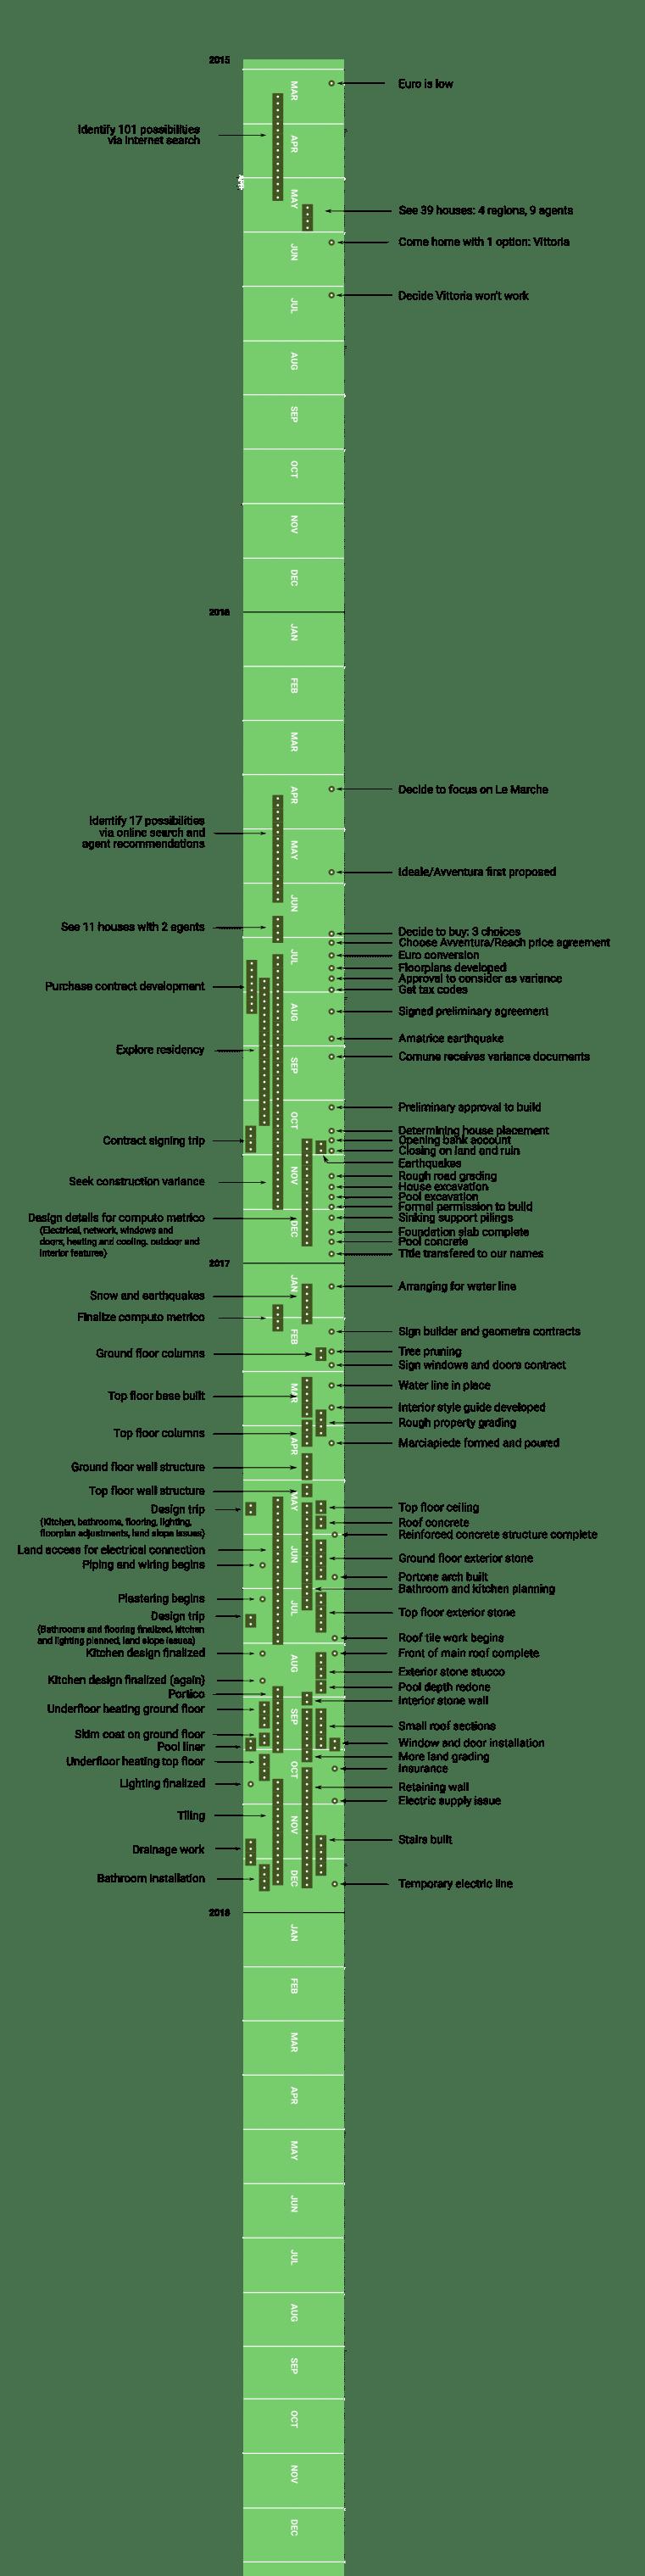 casa avventura graphic timeline